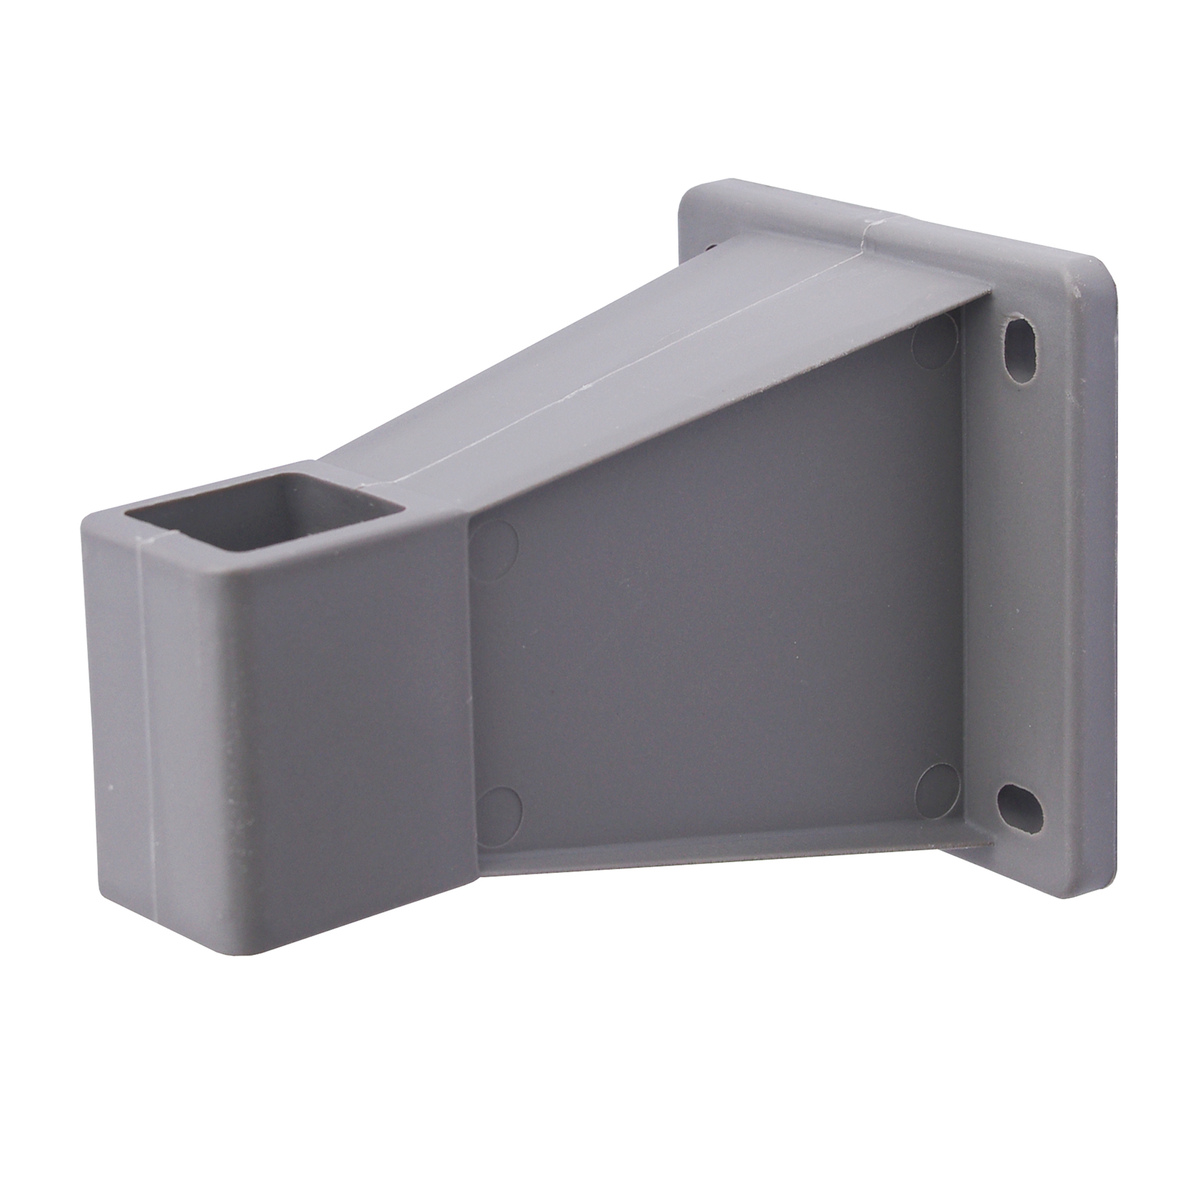 Patio Screen Wall Anchor Pillar Products